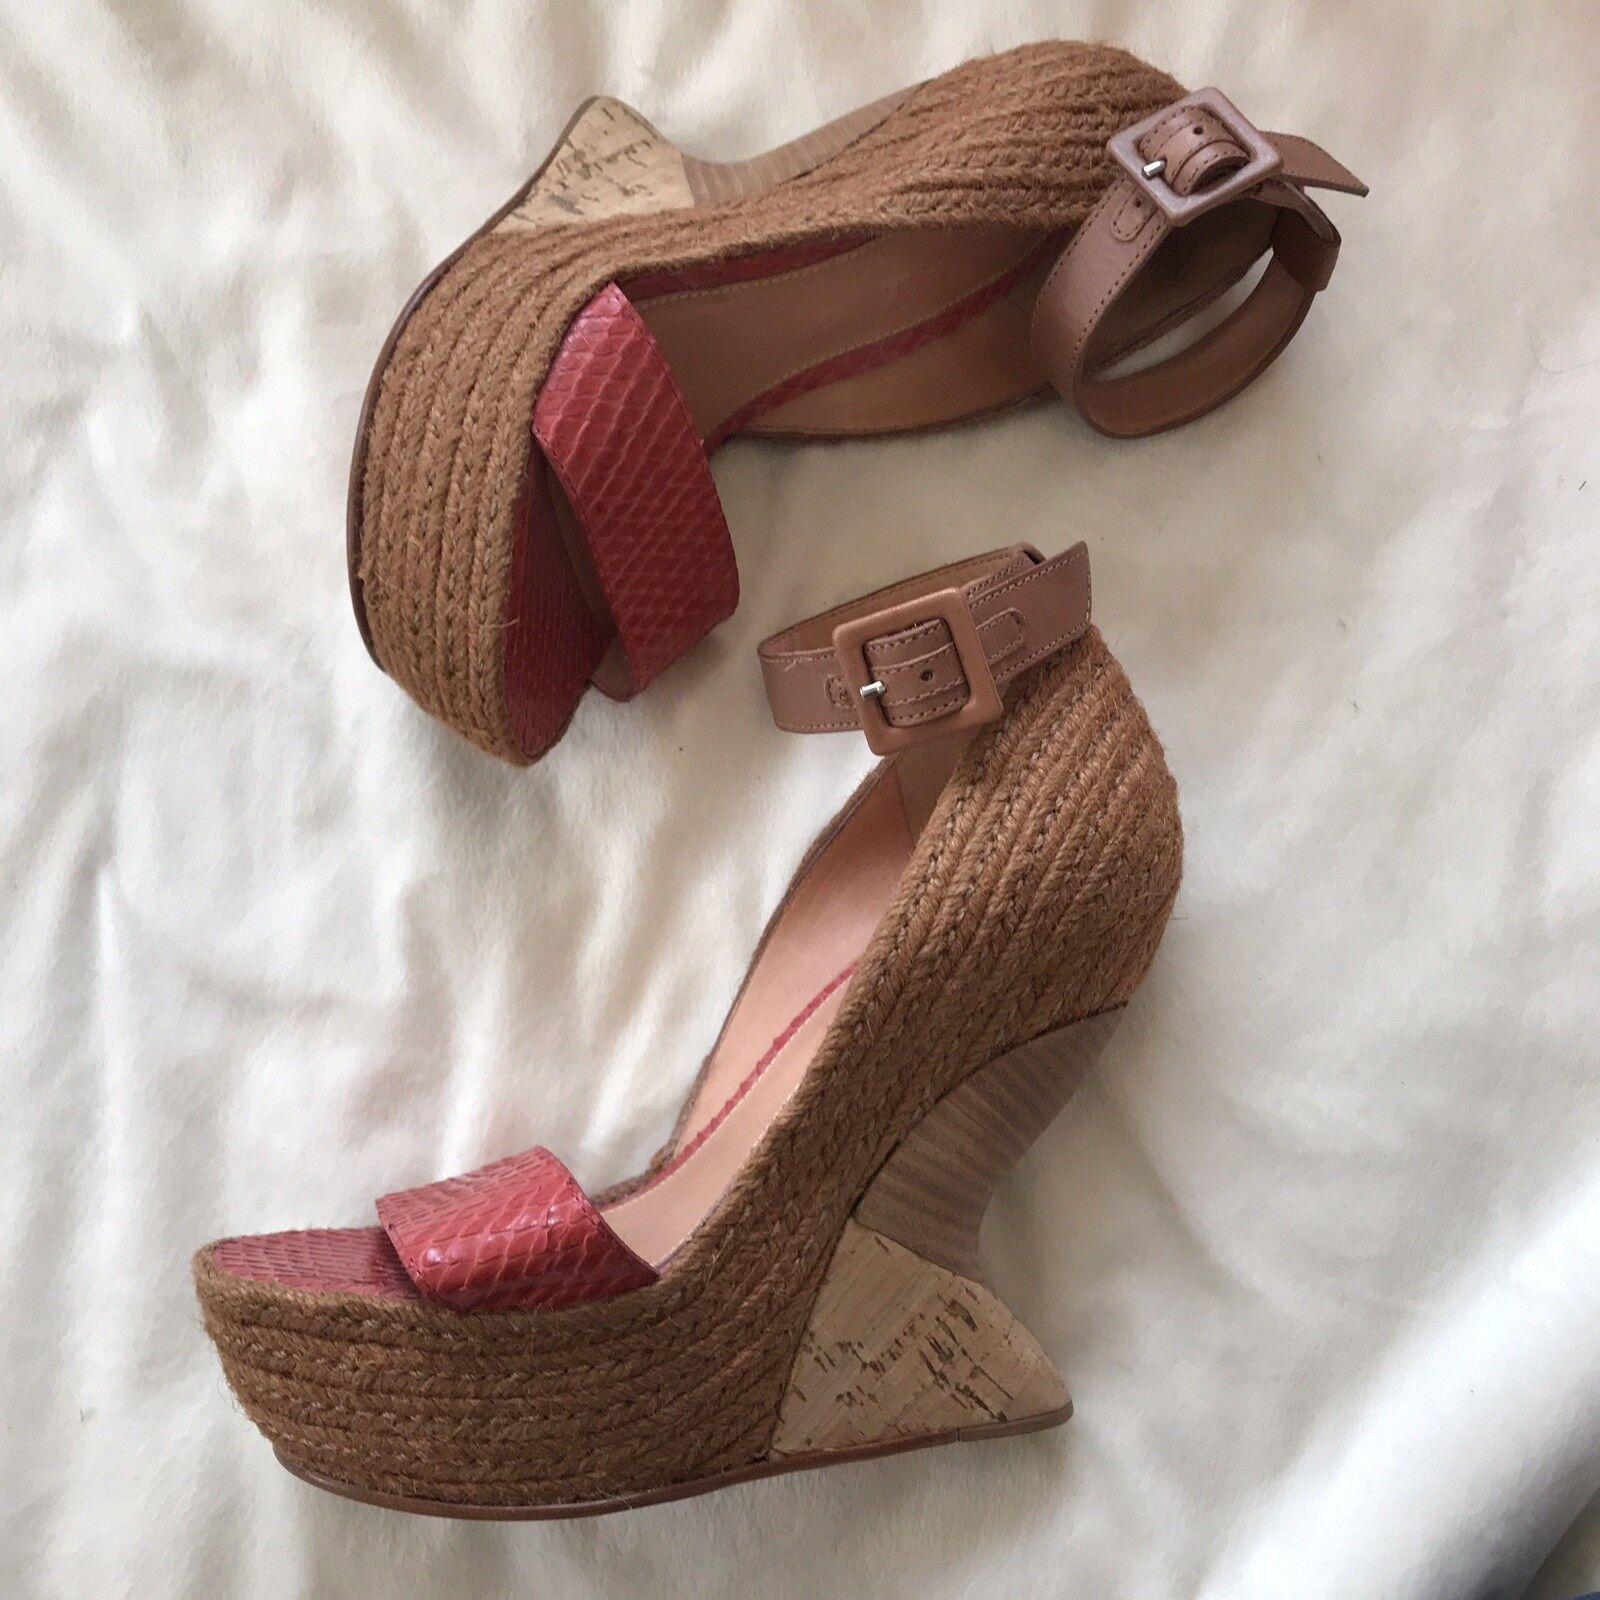 Anthropologie Leifsdottir Red Snakeskin Leather Curved Wedges Sz 36 Womens Heels